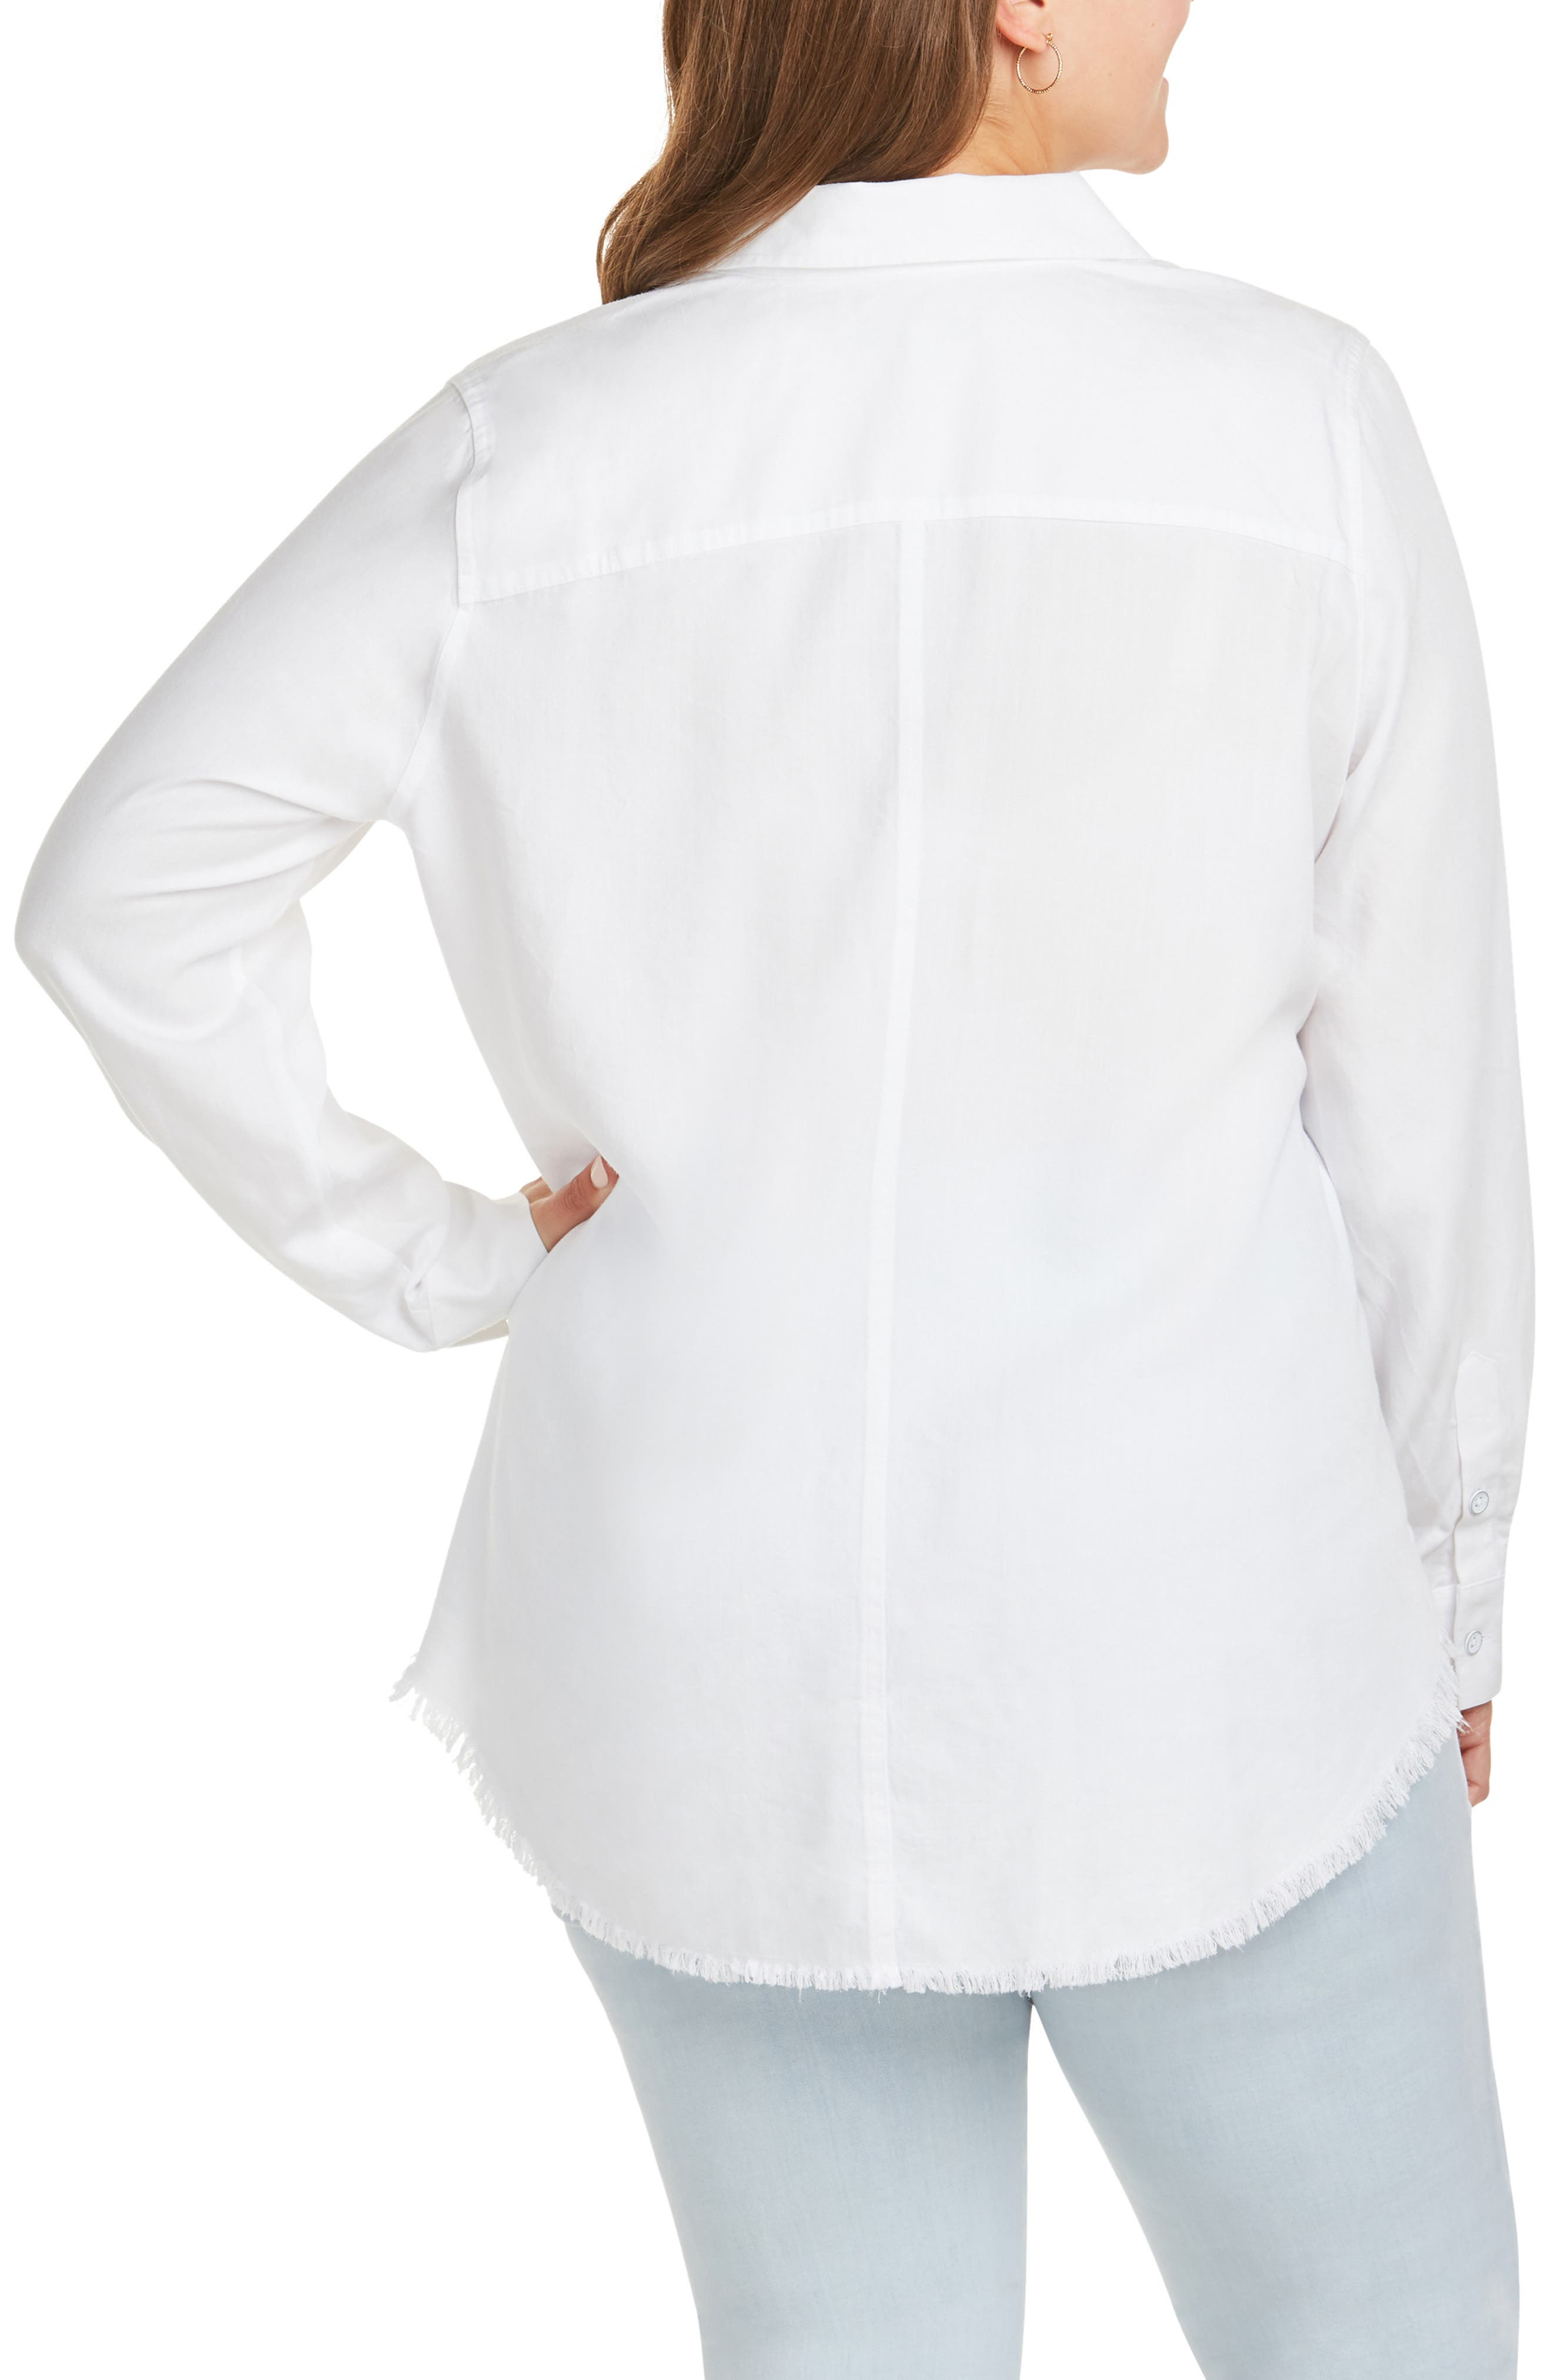 Haven Shirt,                             Alternate thumbnail 2, color,                             WHITE